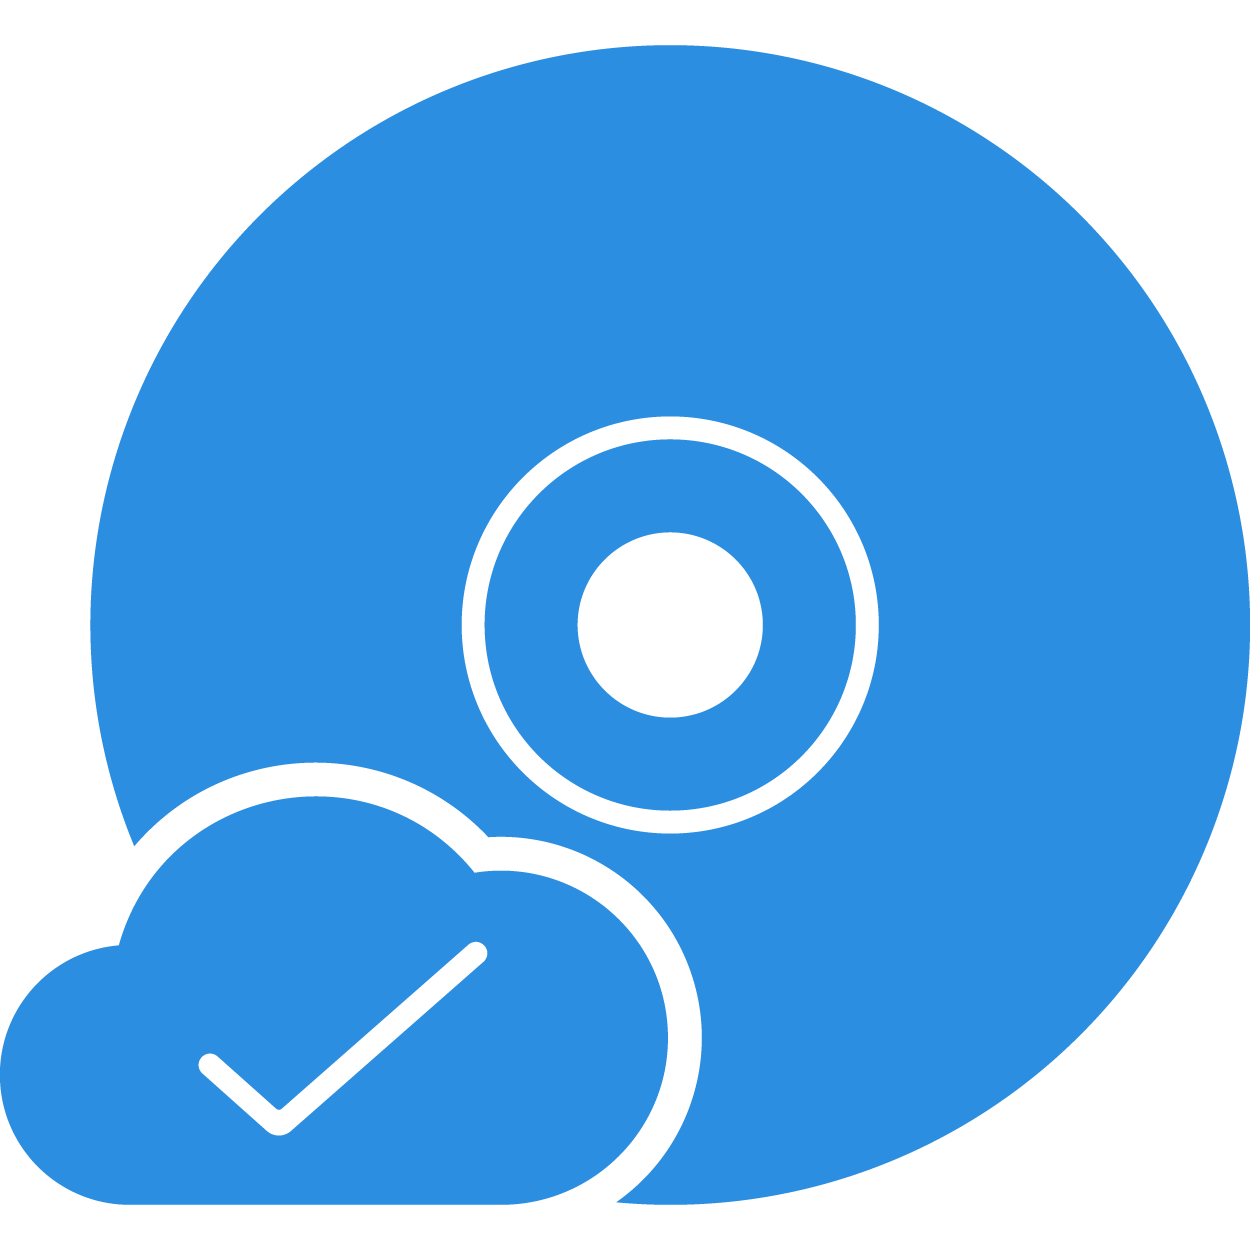 sim_strumenti_software_icona